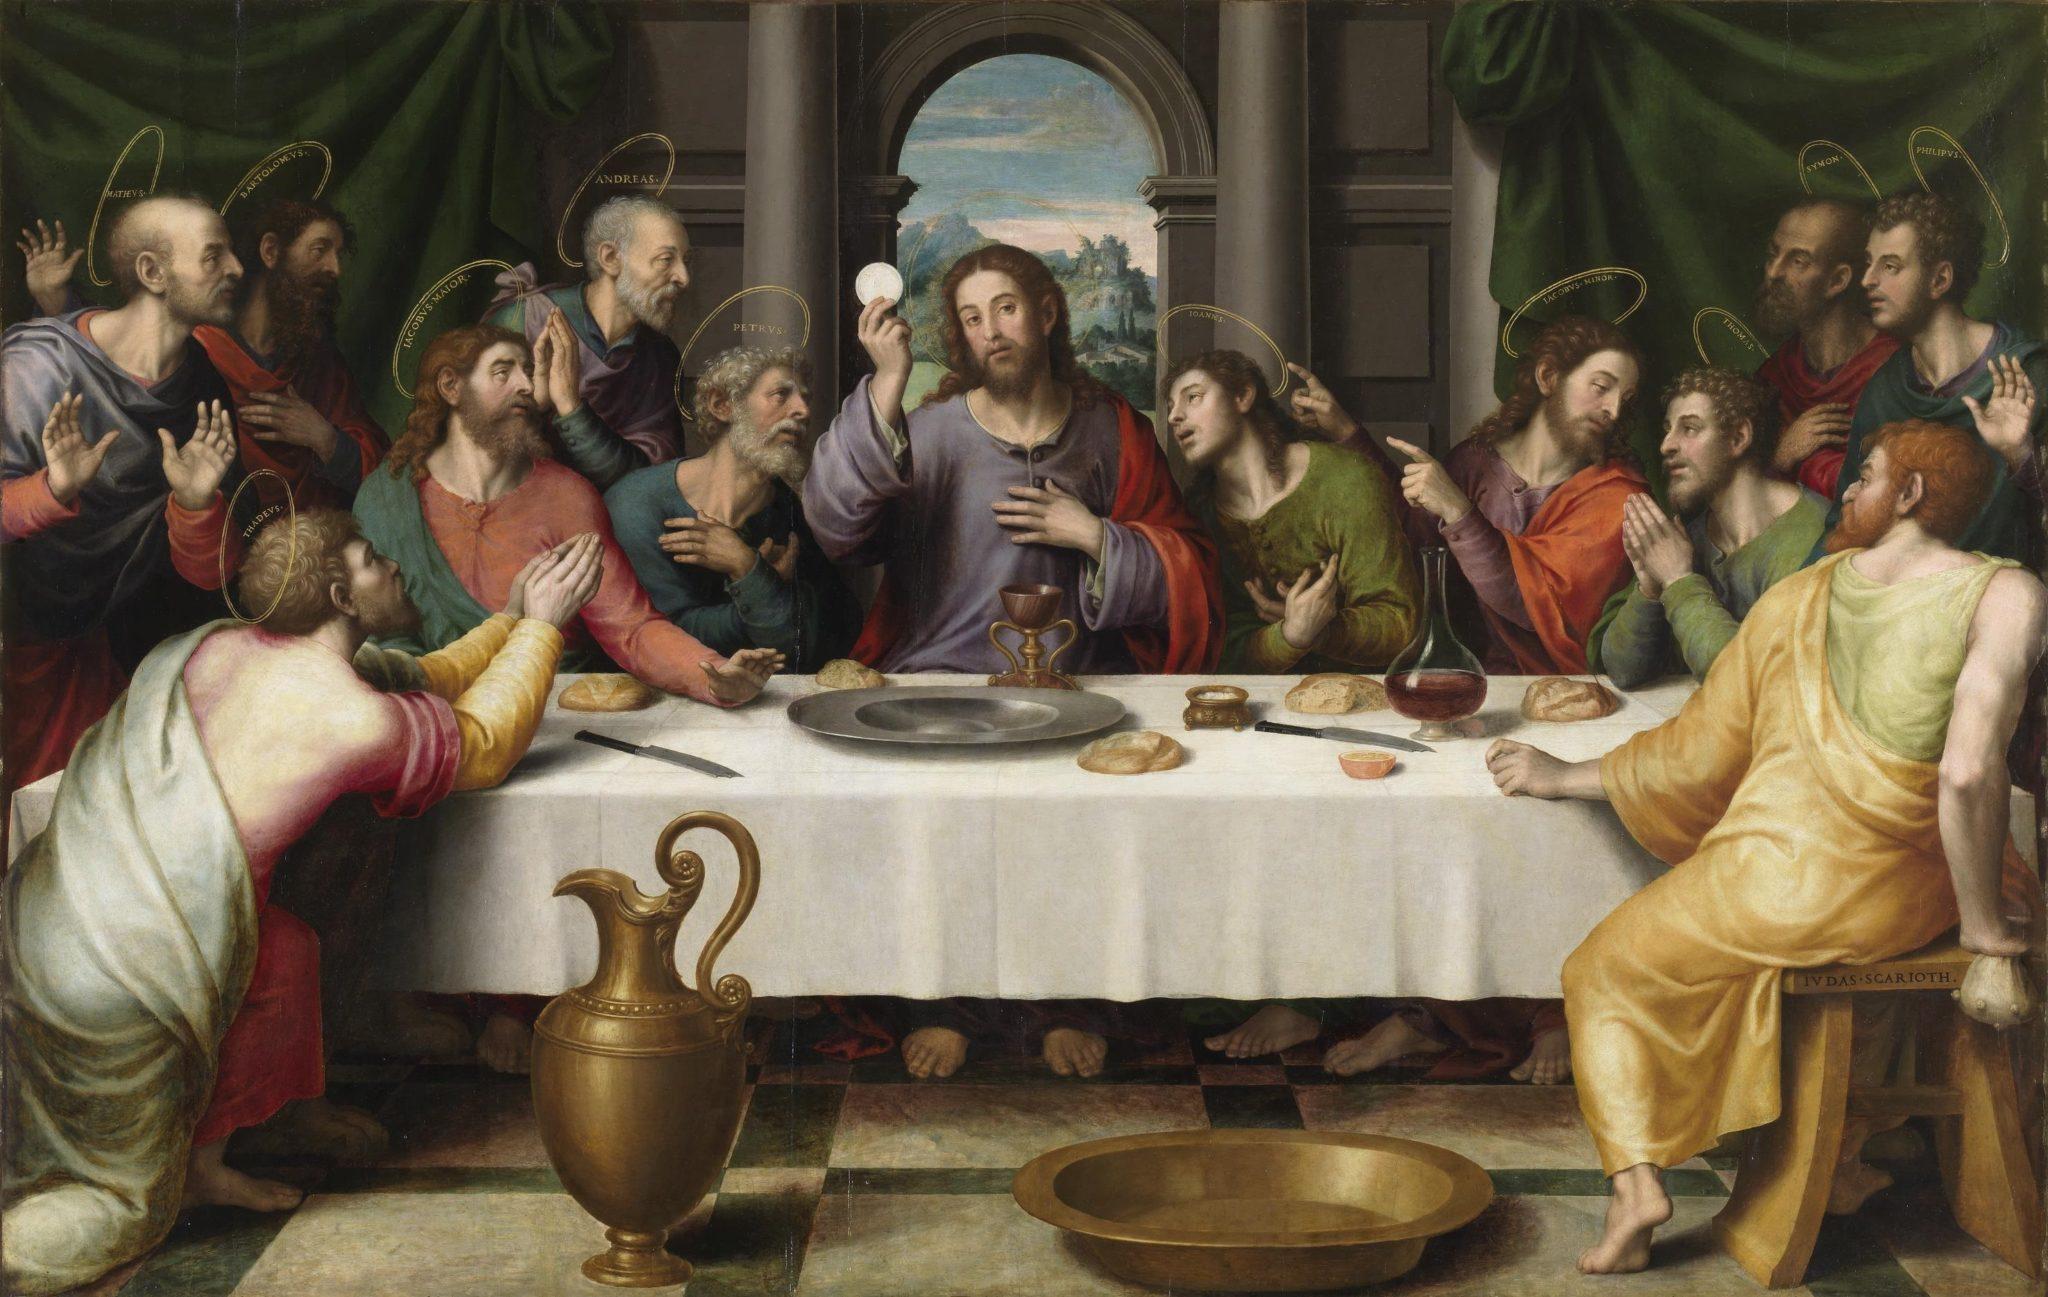 the_last_supper_by_vicente_juan_macip